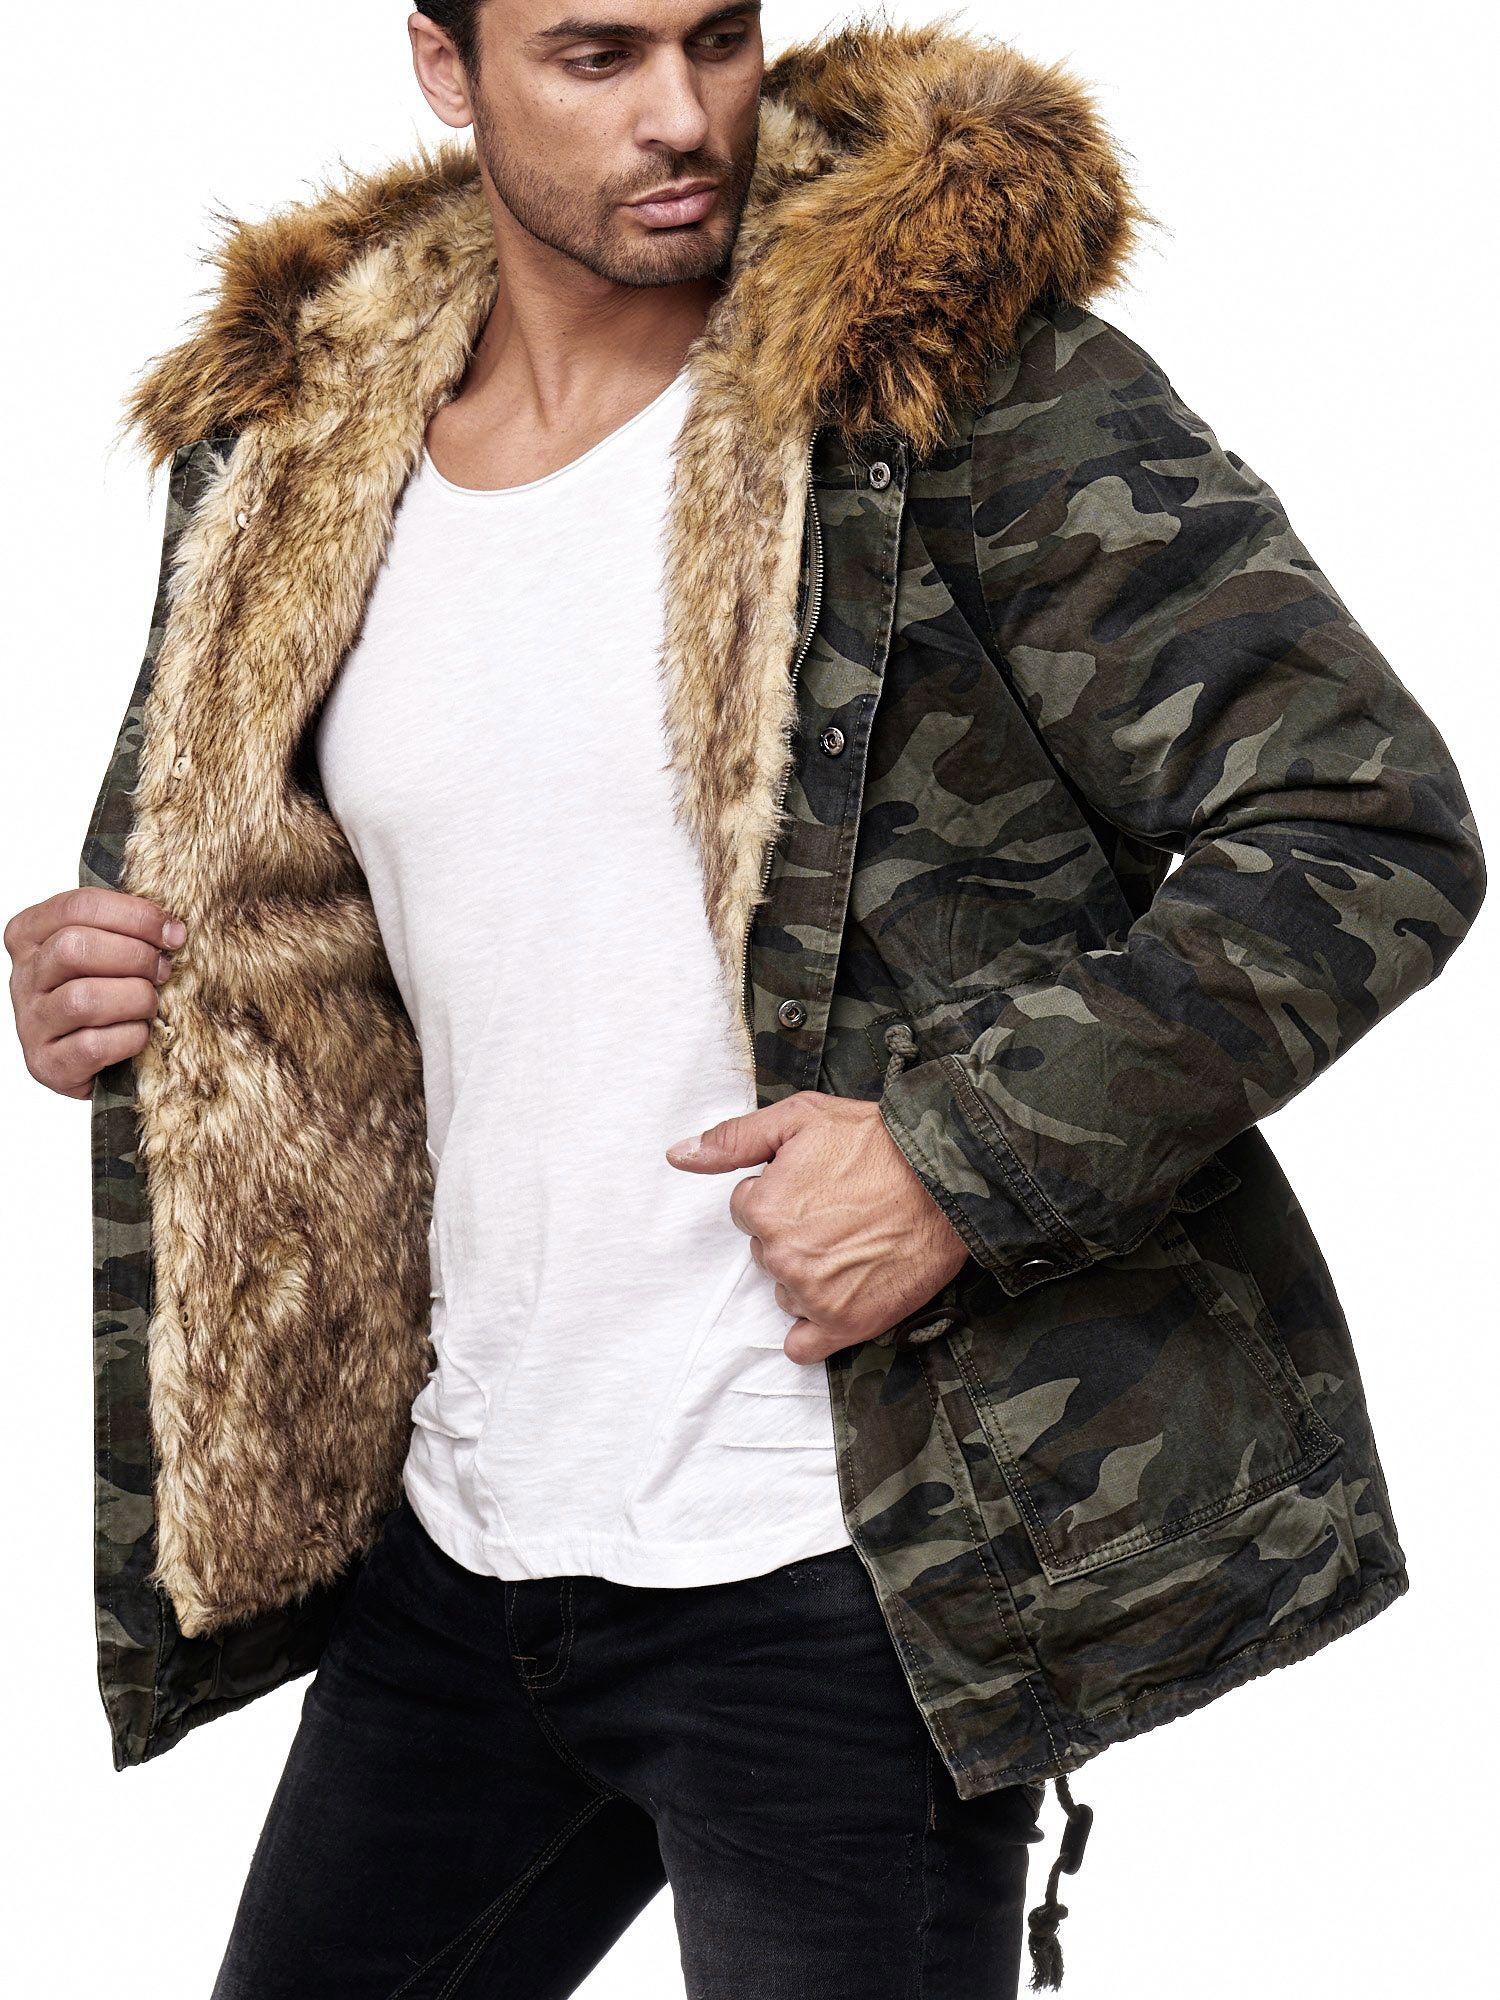 Redbridge Herren Winterjacke Jacke Parka Mantel Mens Jacket Fell Fur Camouflage Parka Mit Pelz Fell Parka Felljacke Herren